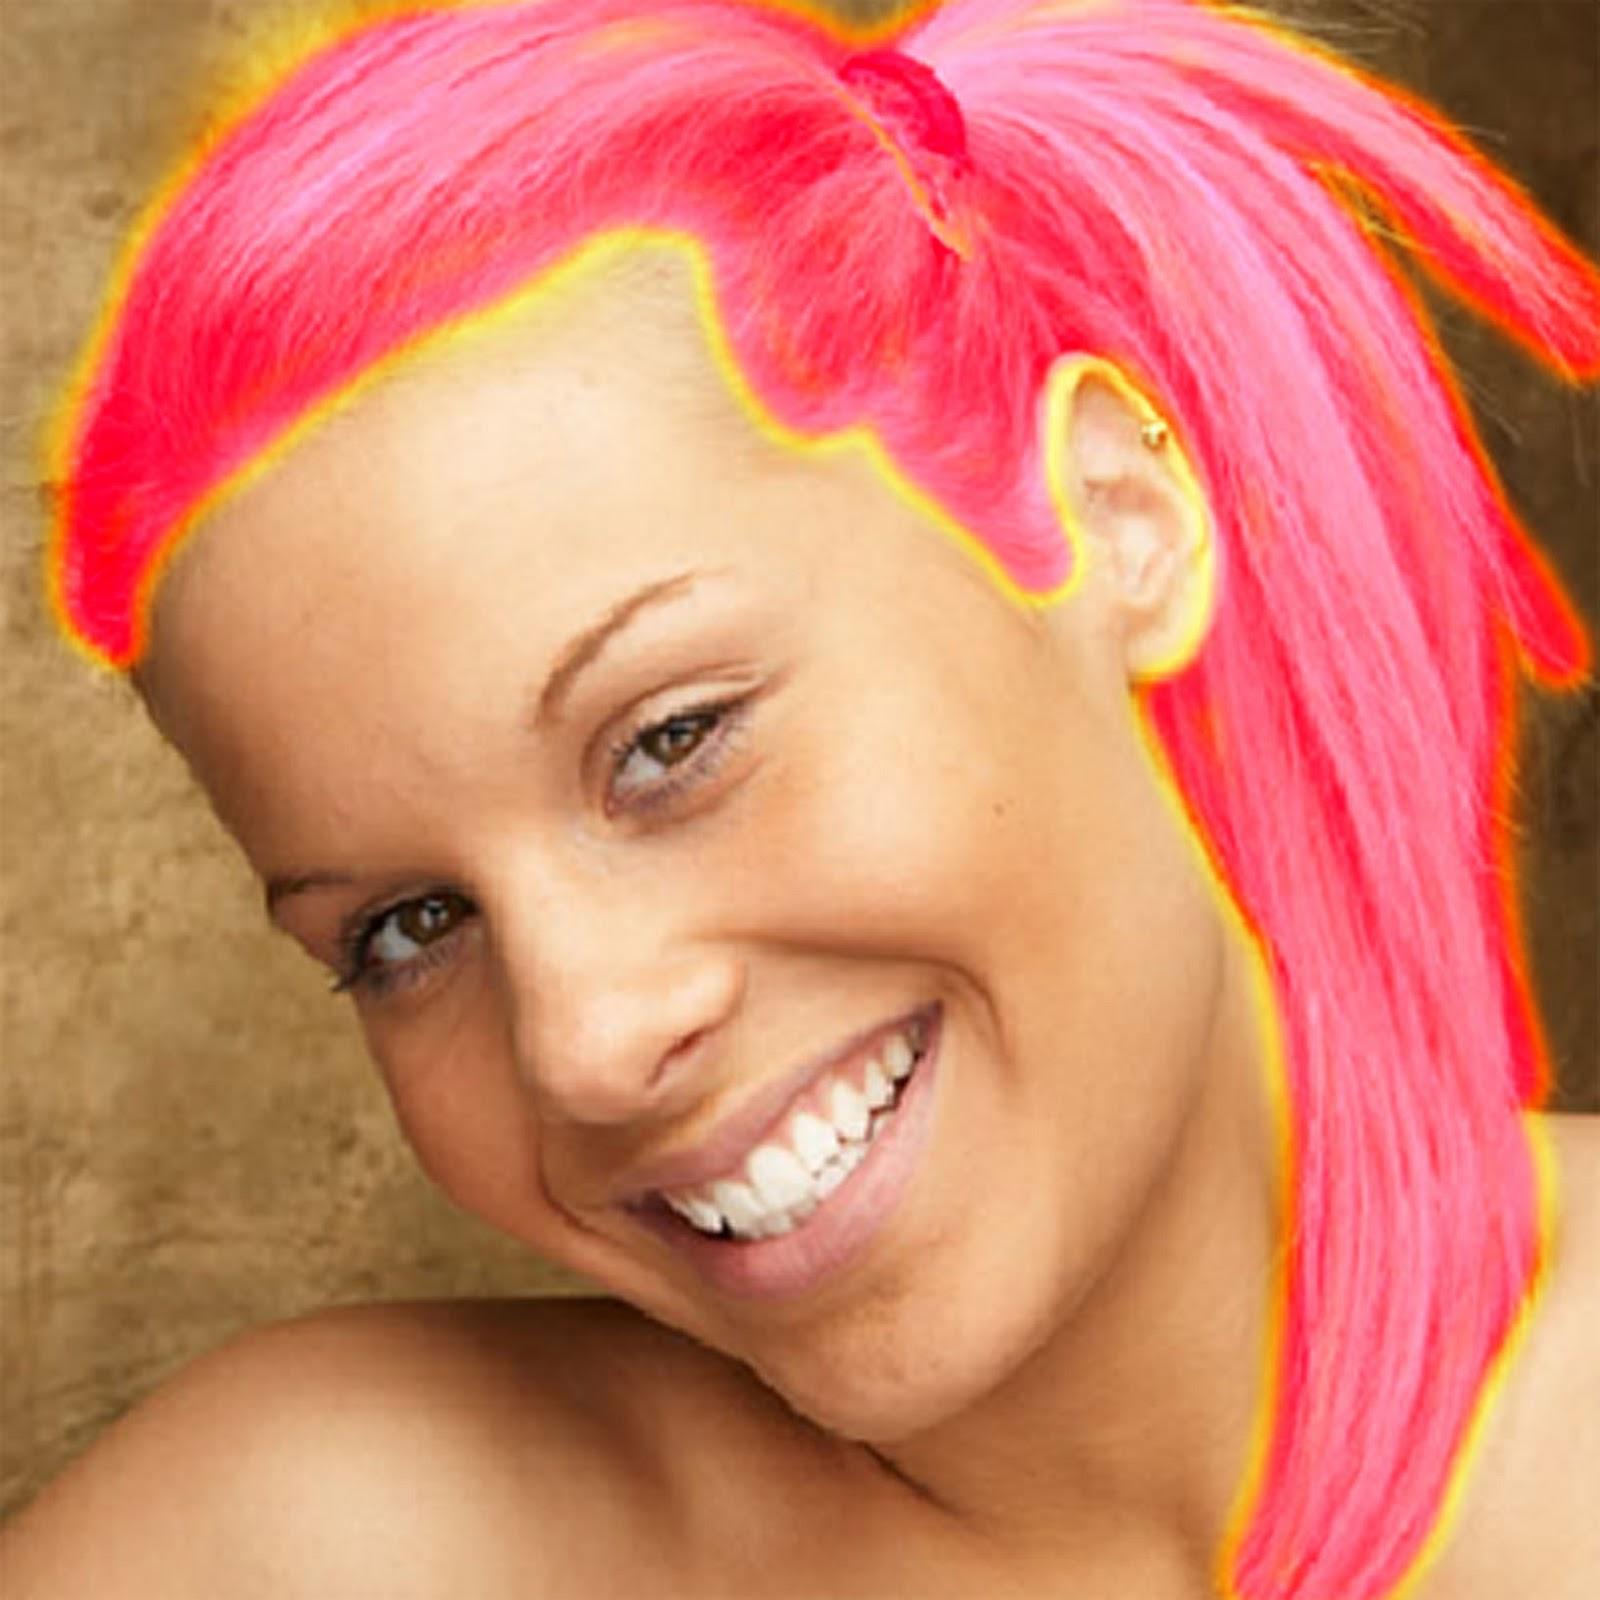 Меняет цвет волос на фото